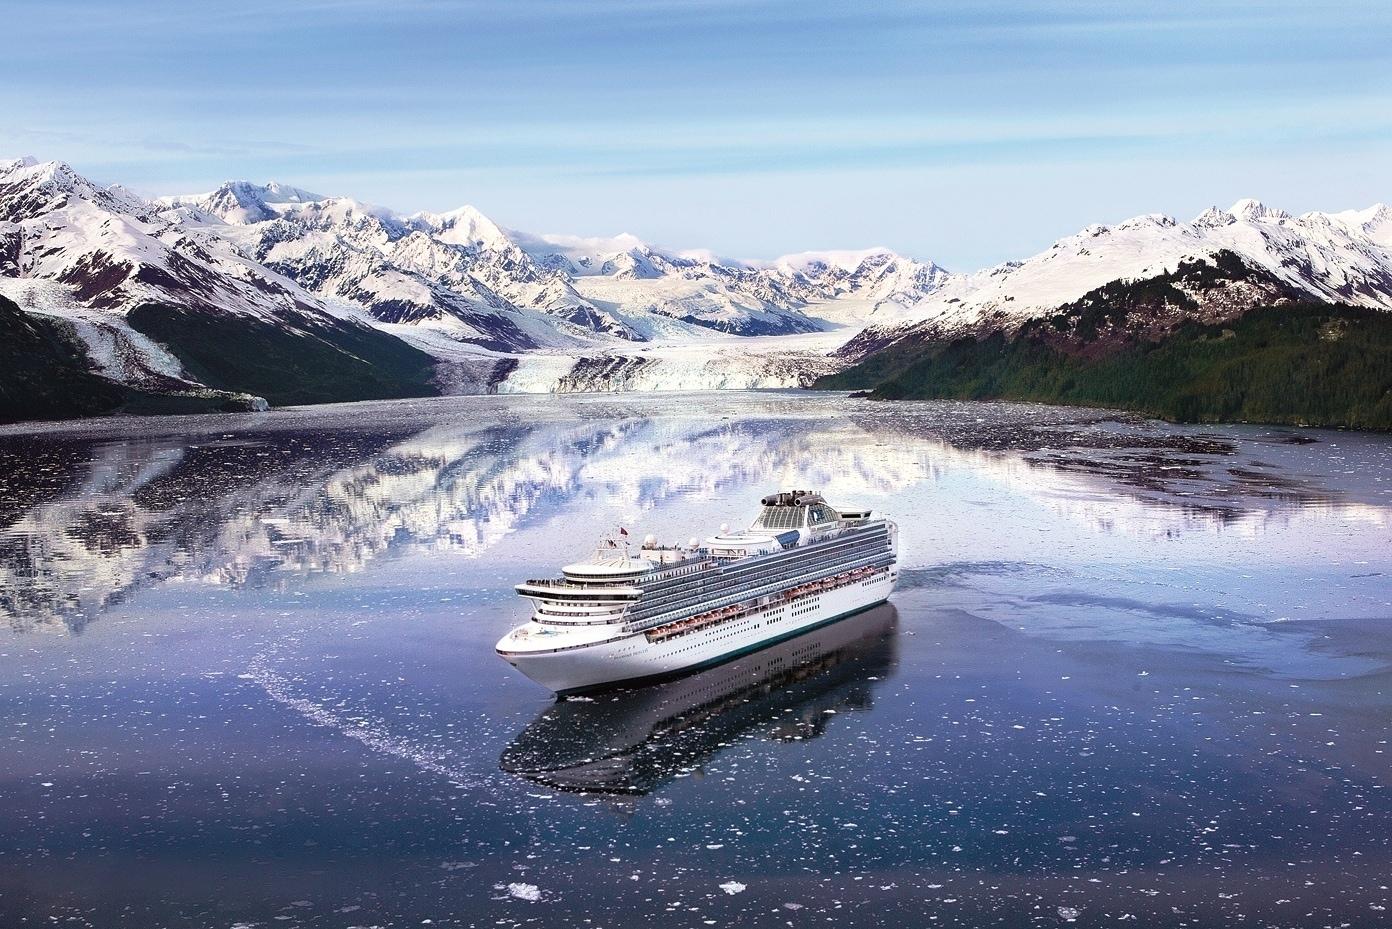 Paquetes de viaje con acompañamiento - Princess Alaska Rail Tours